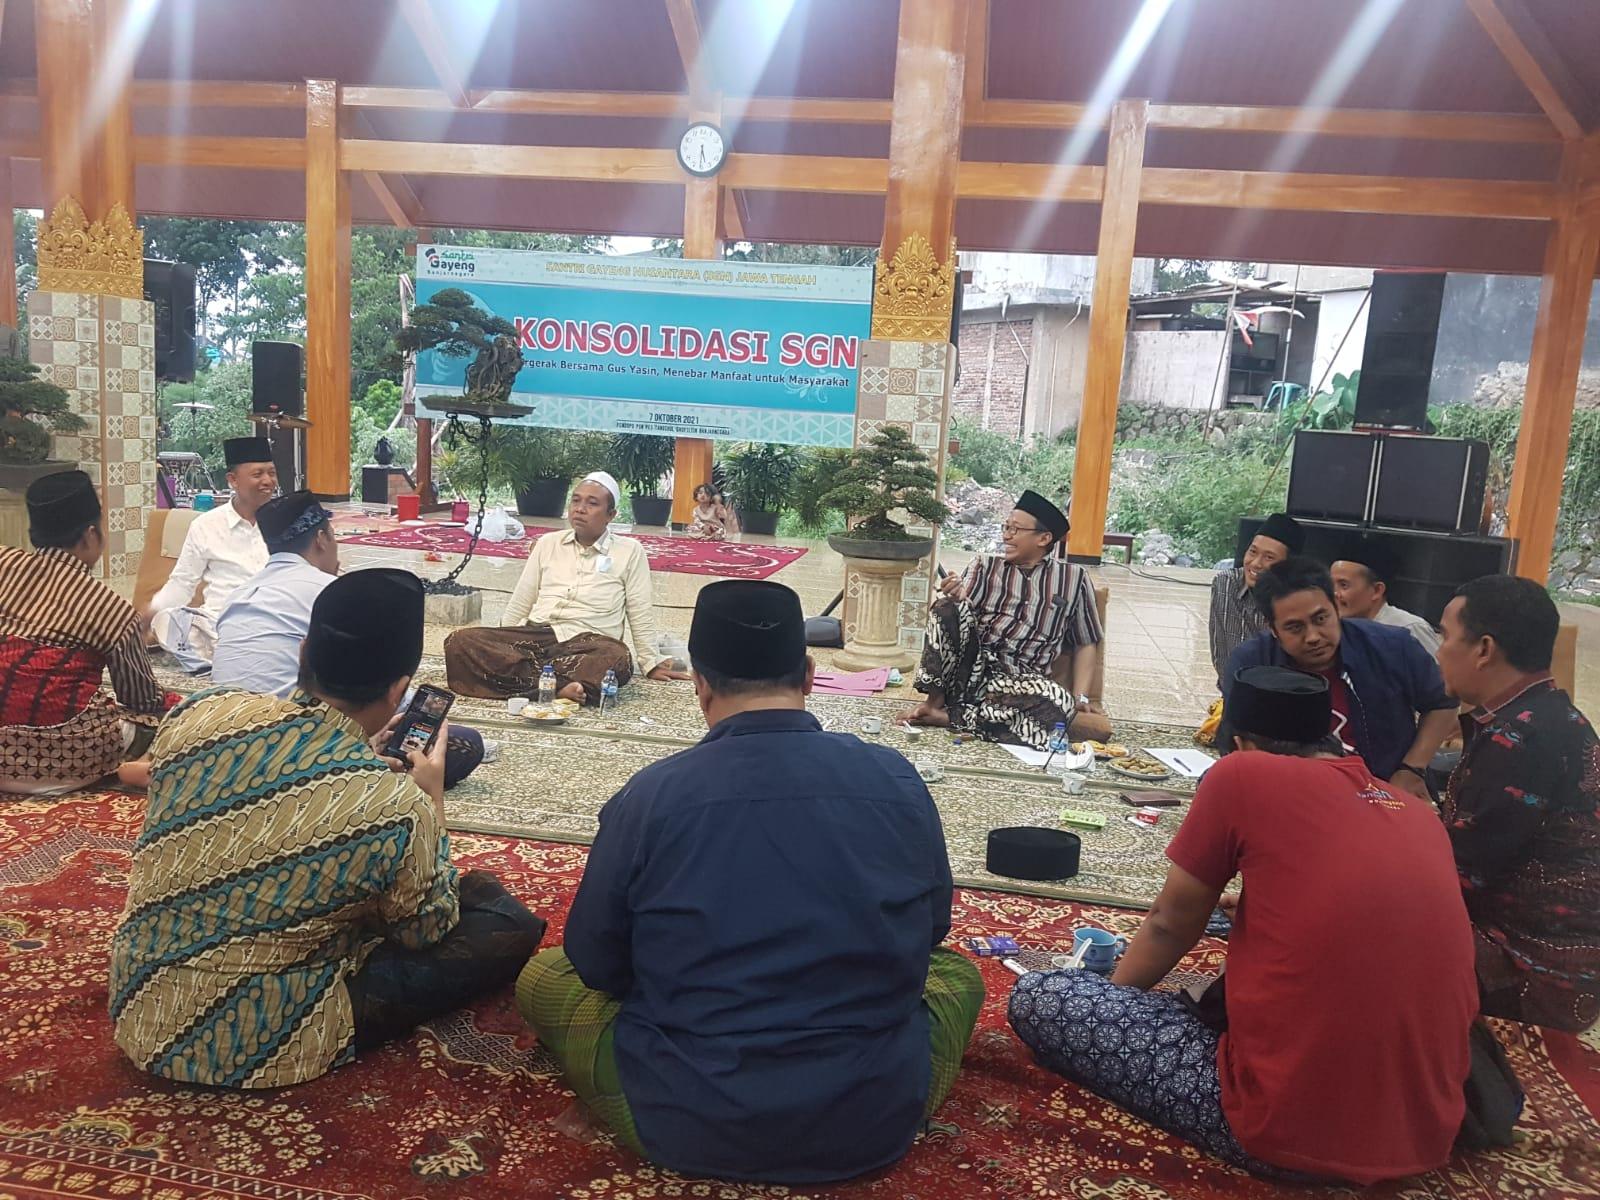 Acara Pertemuan Santri Gayen Nusantara, Jawa Tengah Bagian Selatan, TimH2/Lingkar.co